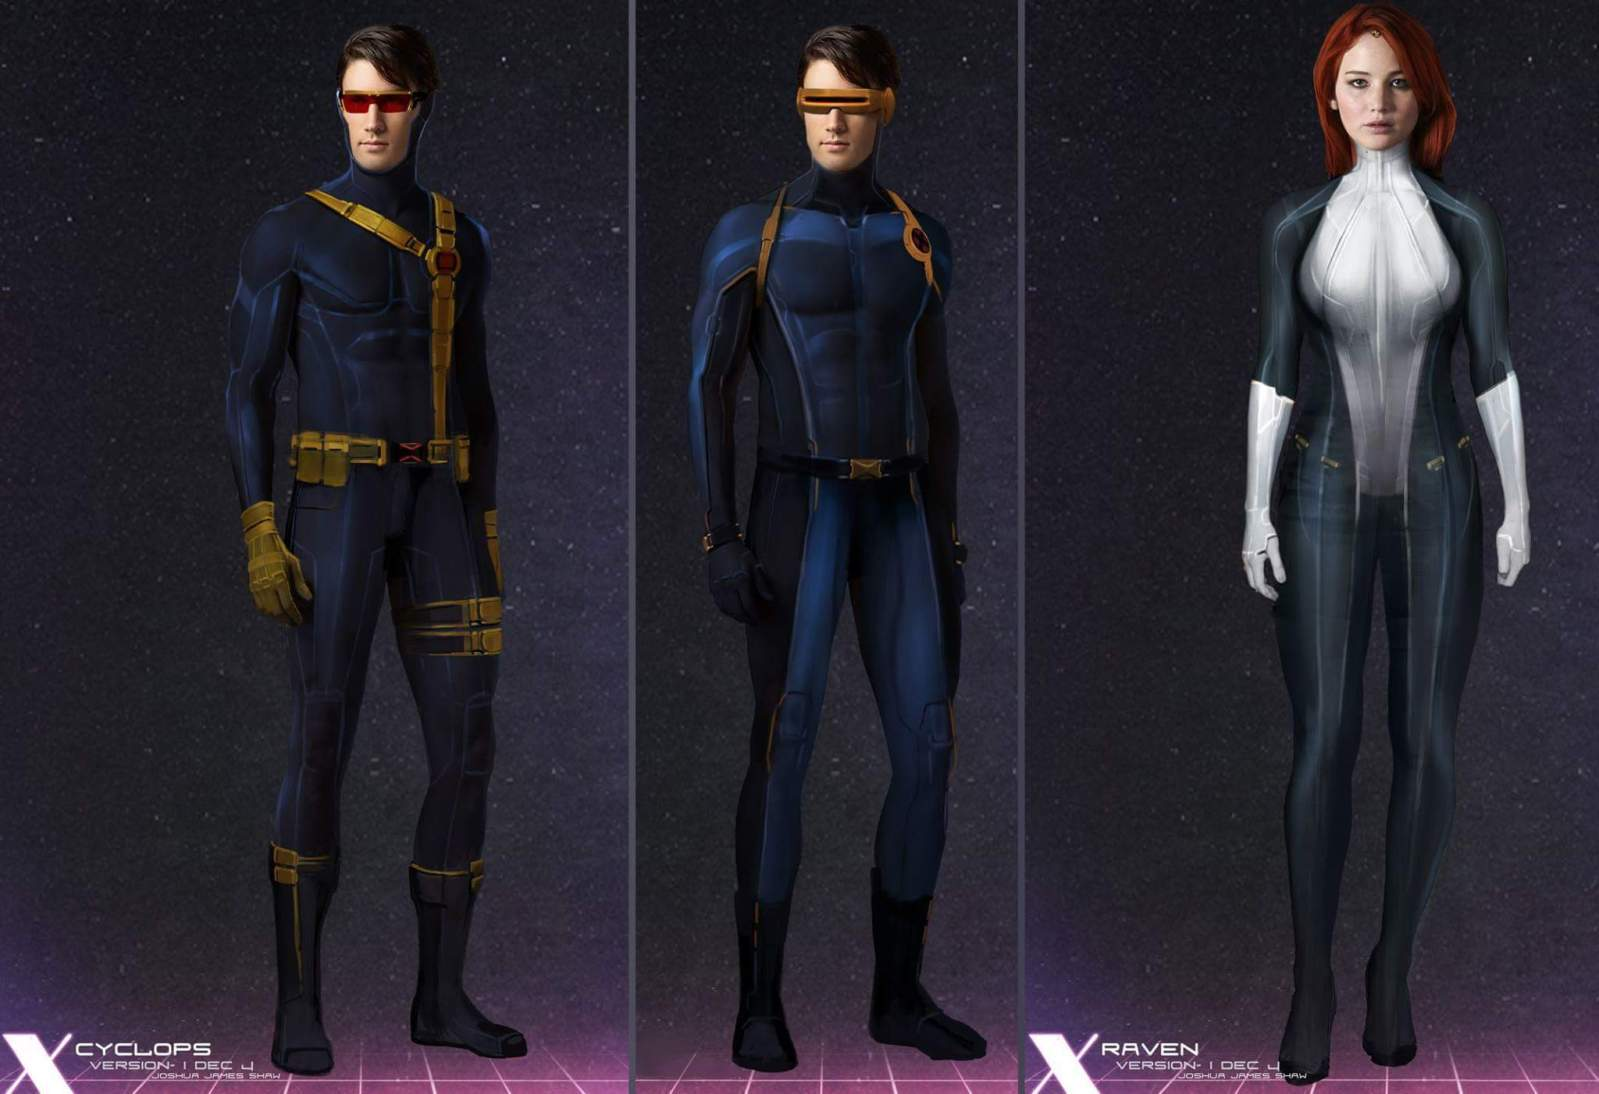 X-Men Apocalypse Concept Art Cyclops and Mystique